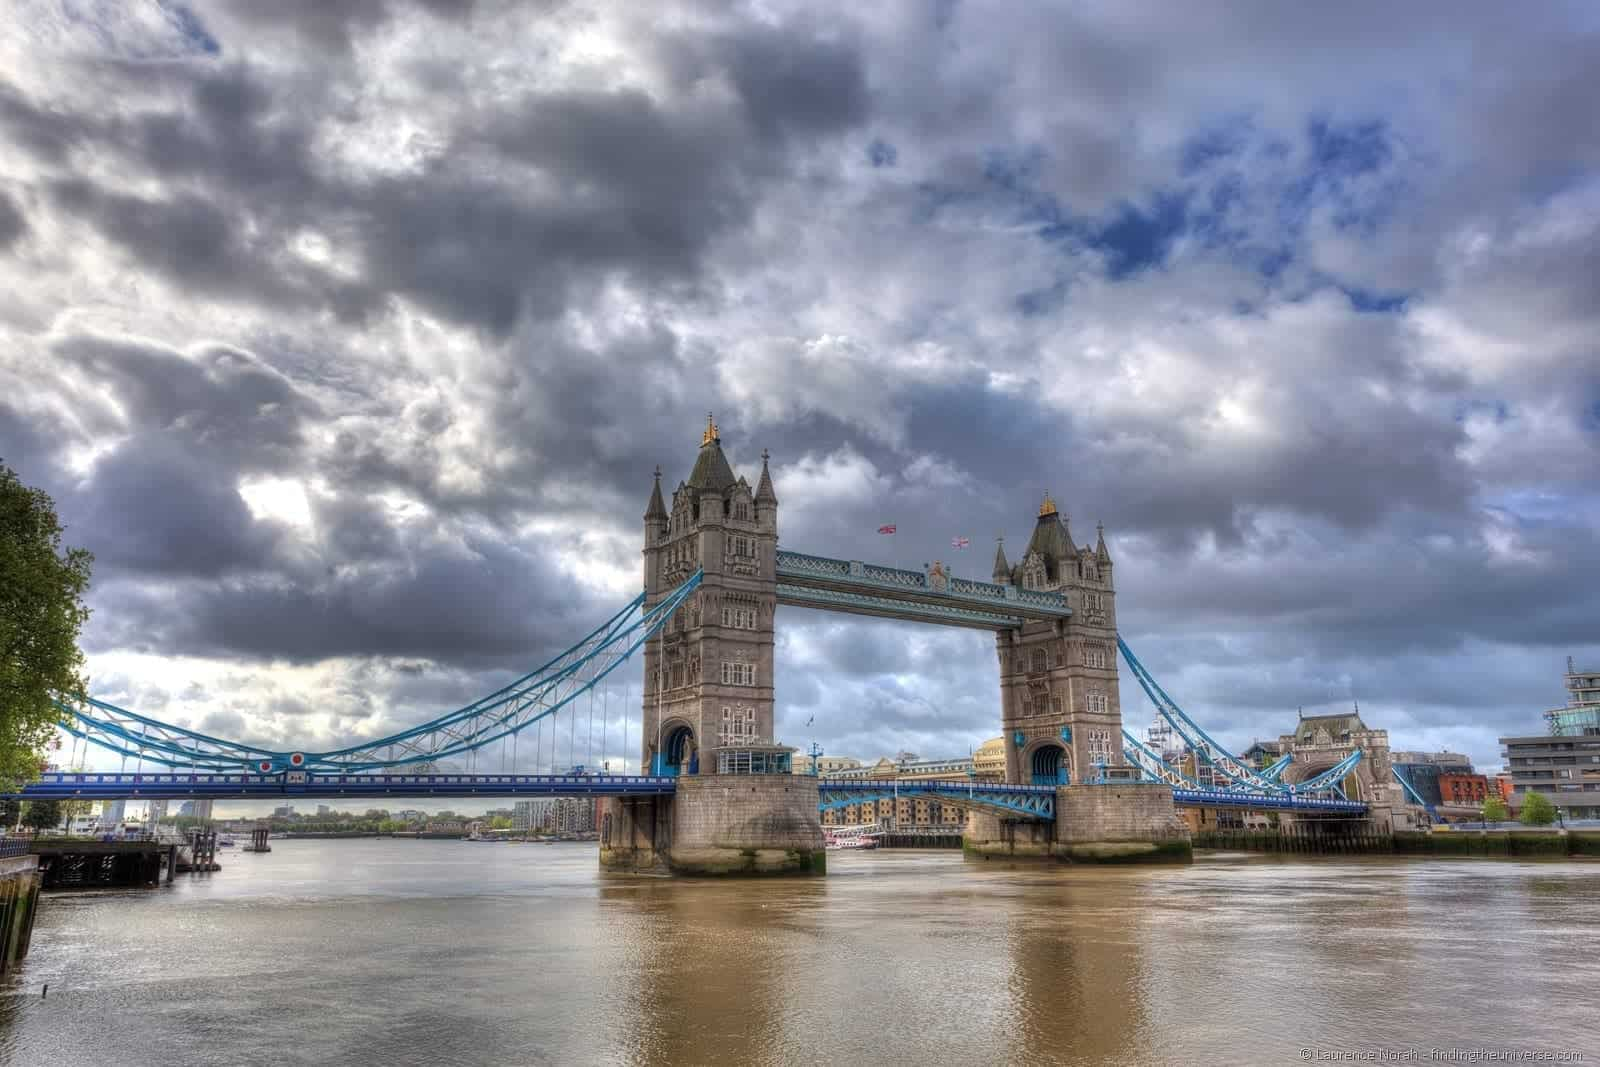 A photograph of London Bridge.